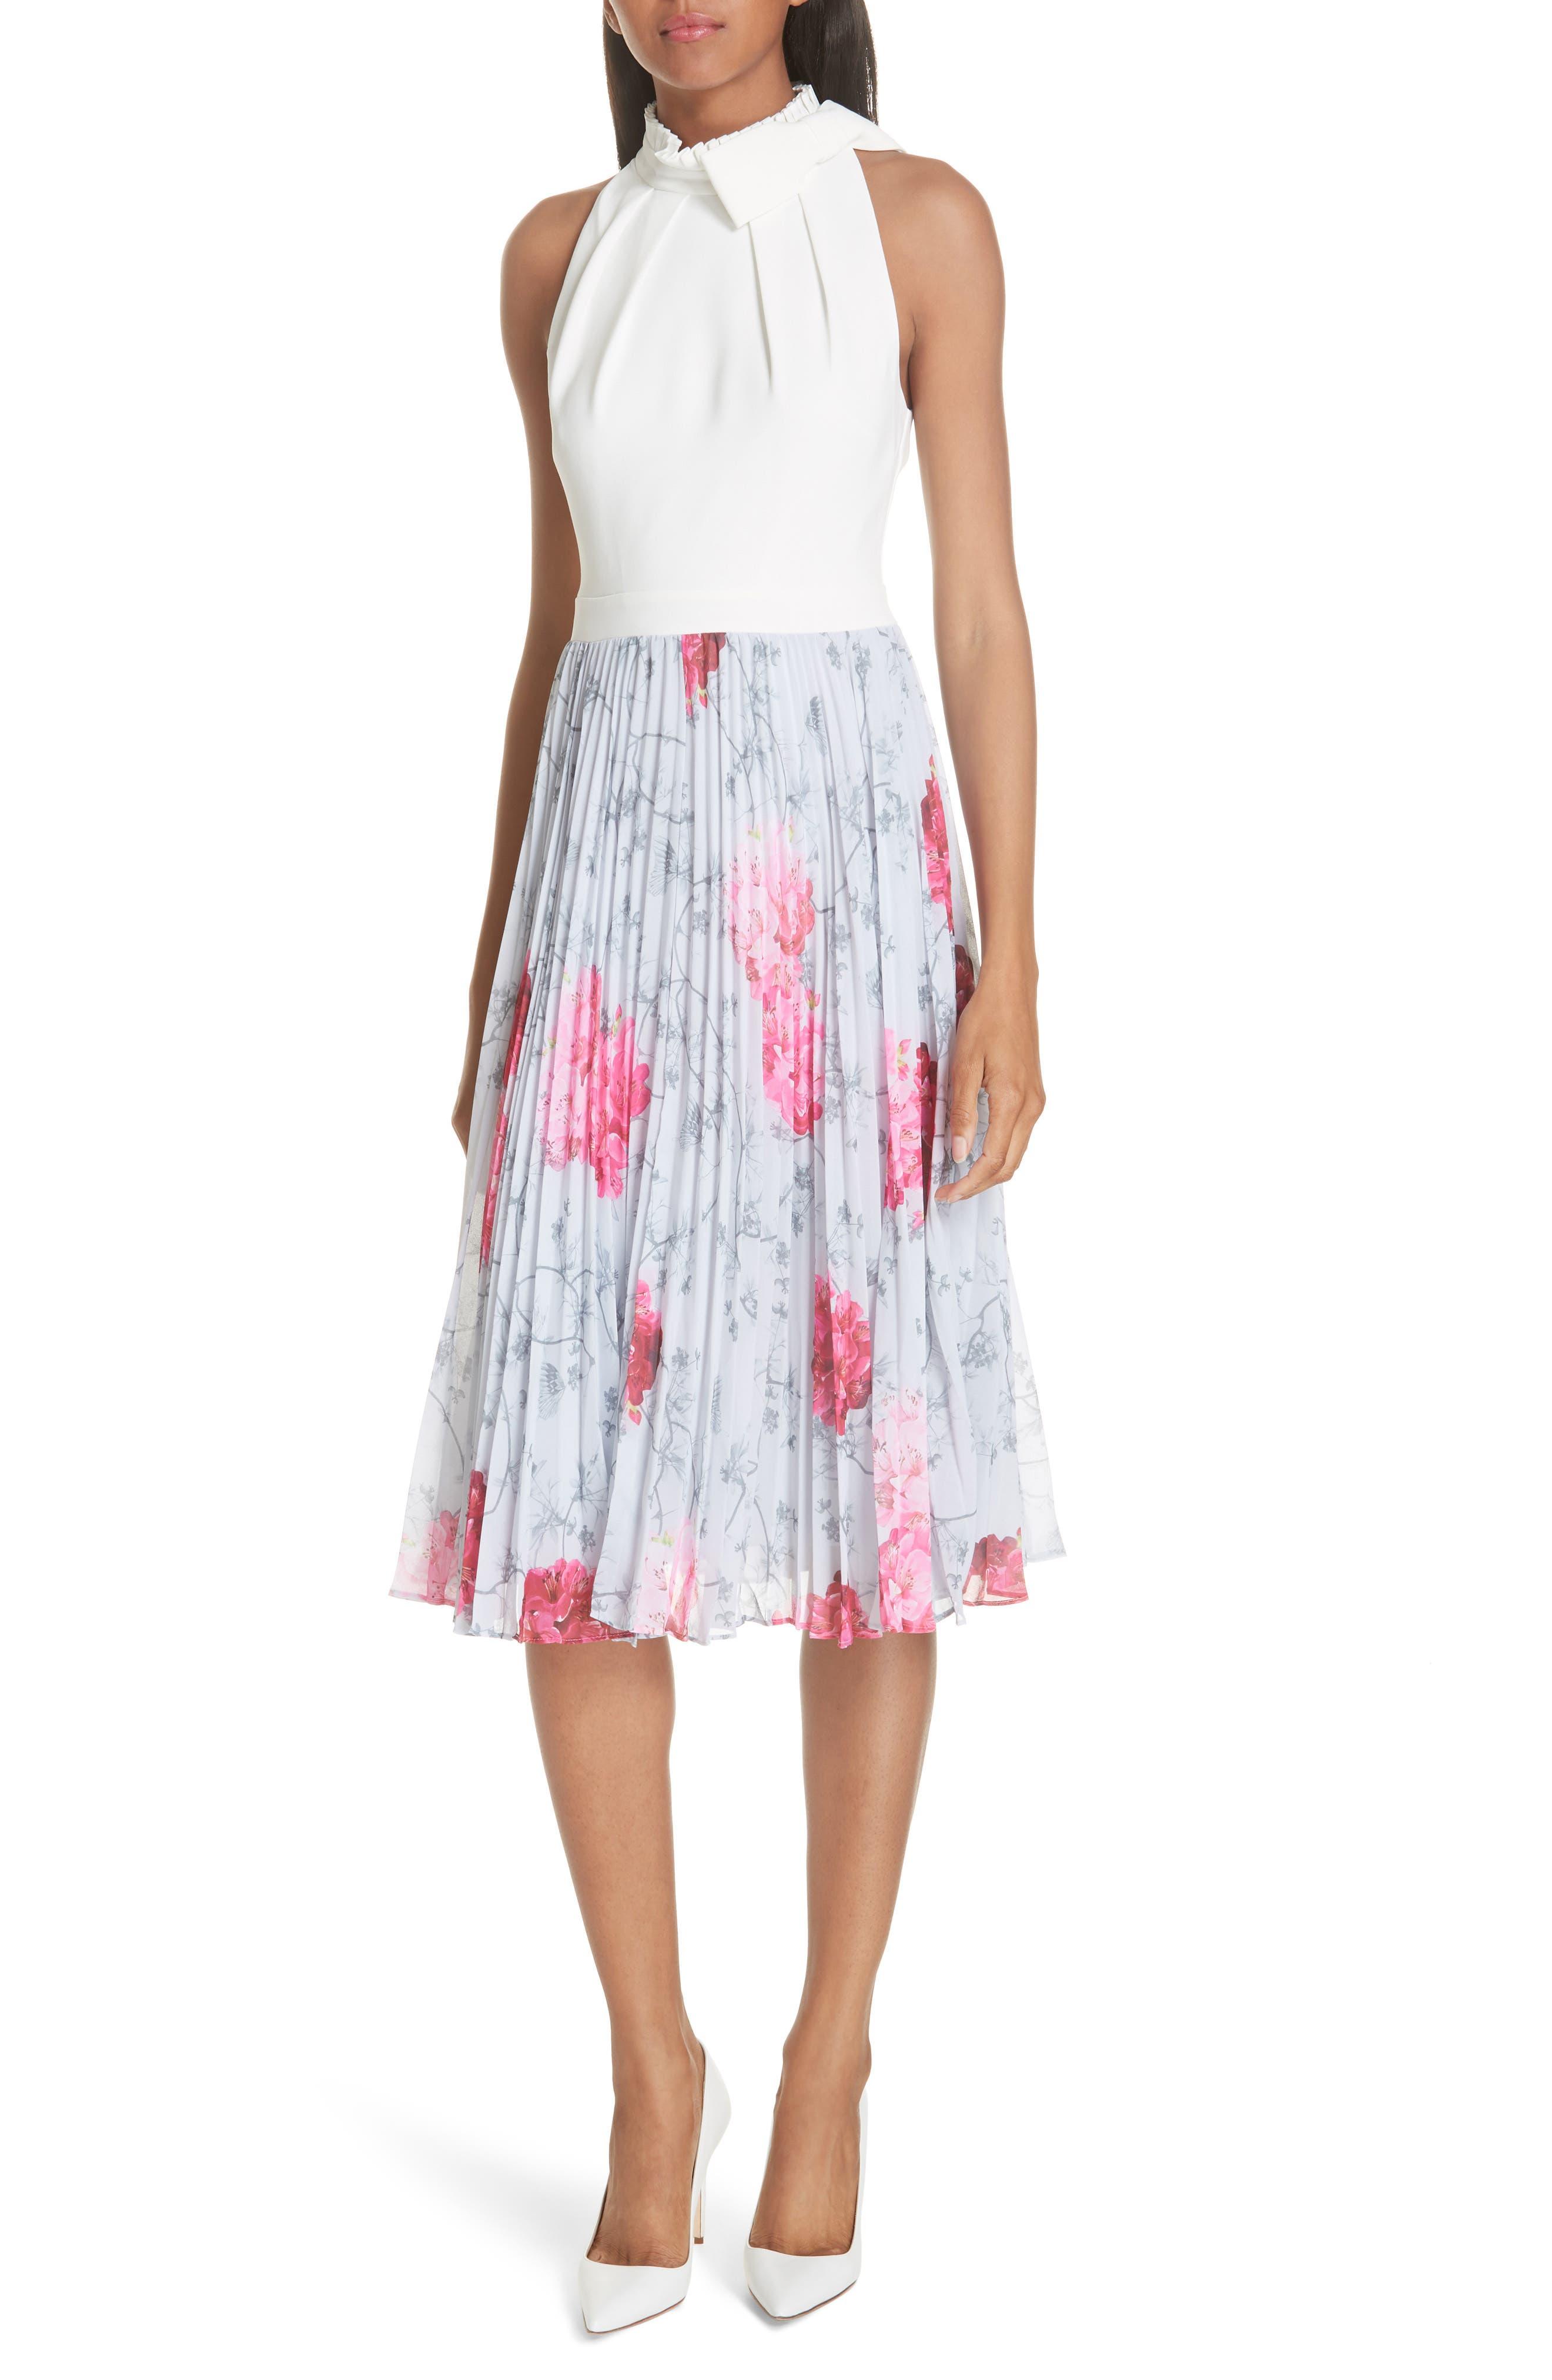 Babylon Pleat A-Line Dress,                             Main thumbnail 1, color,                             GREY